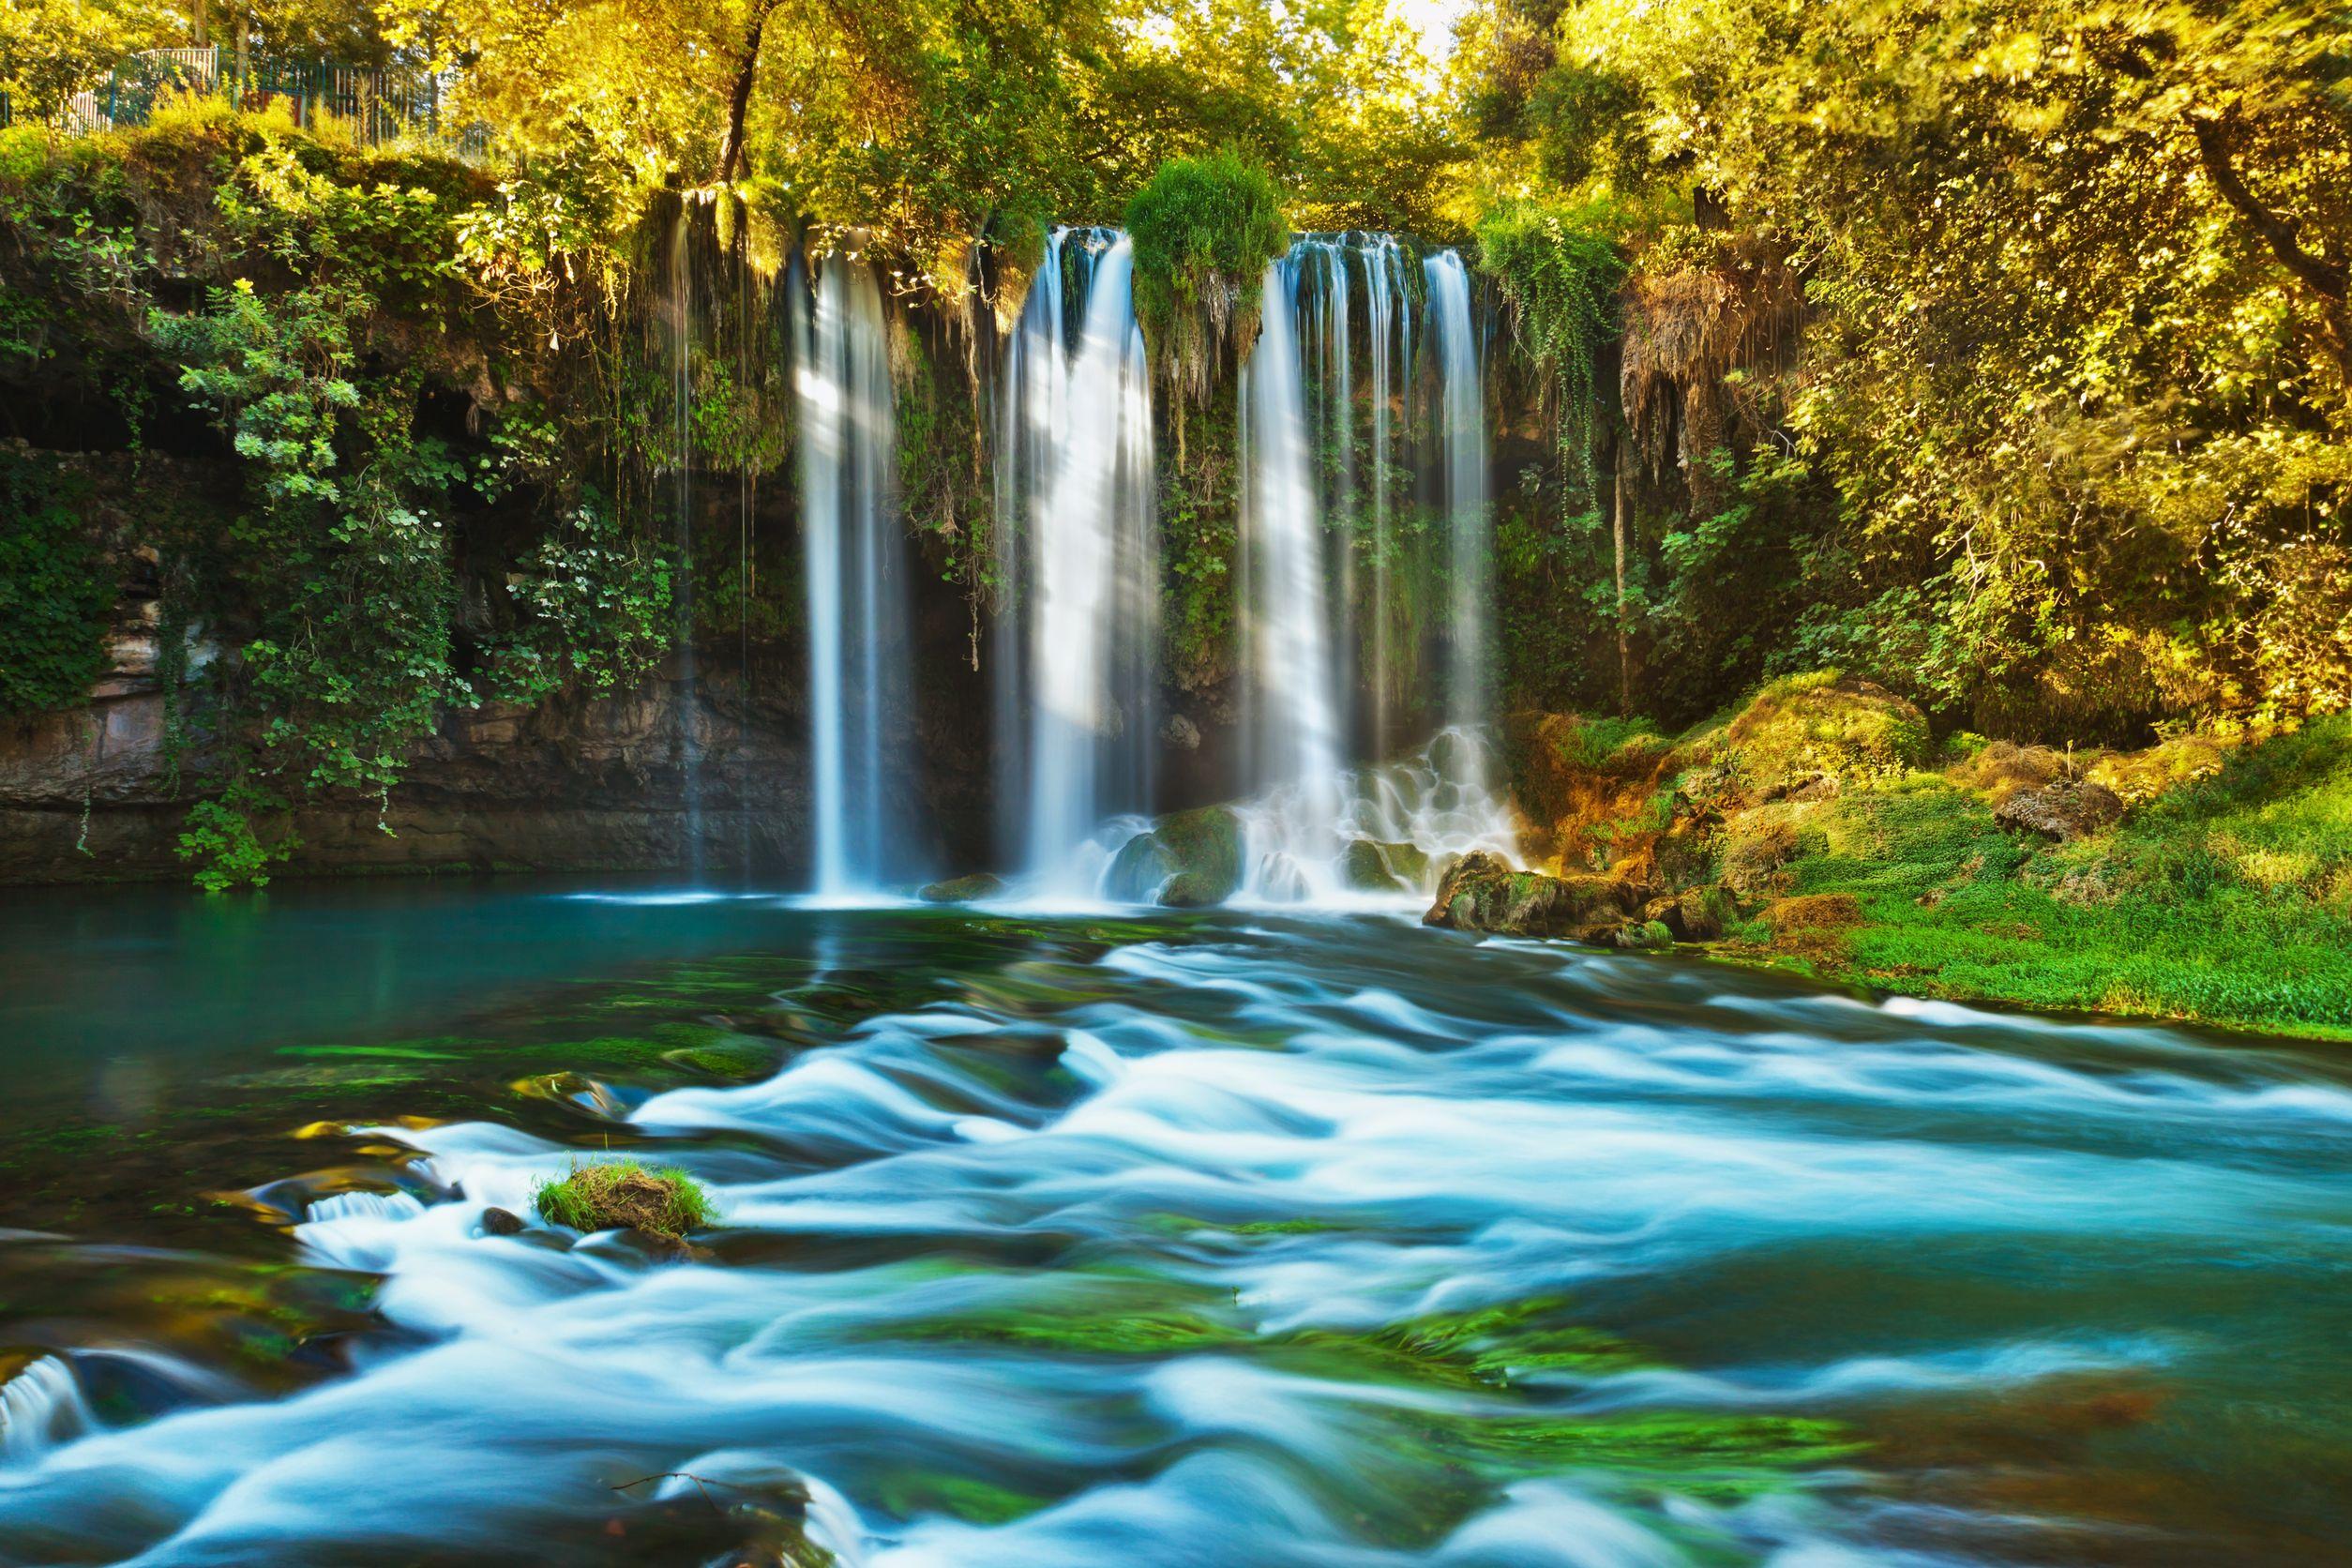 Waterfall-Duden-at-Antalya-Turkey